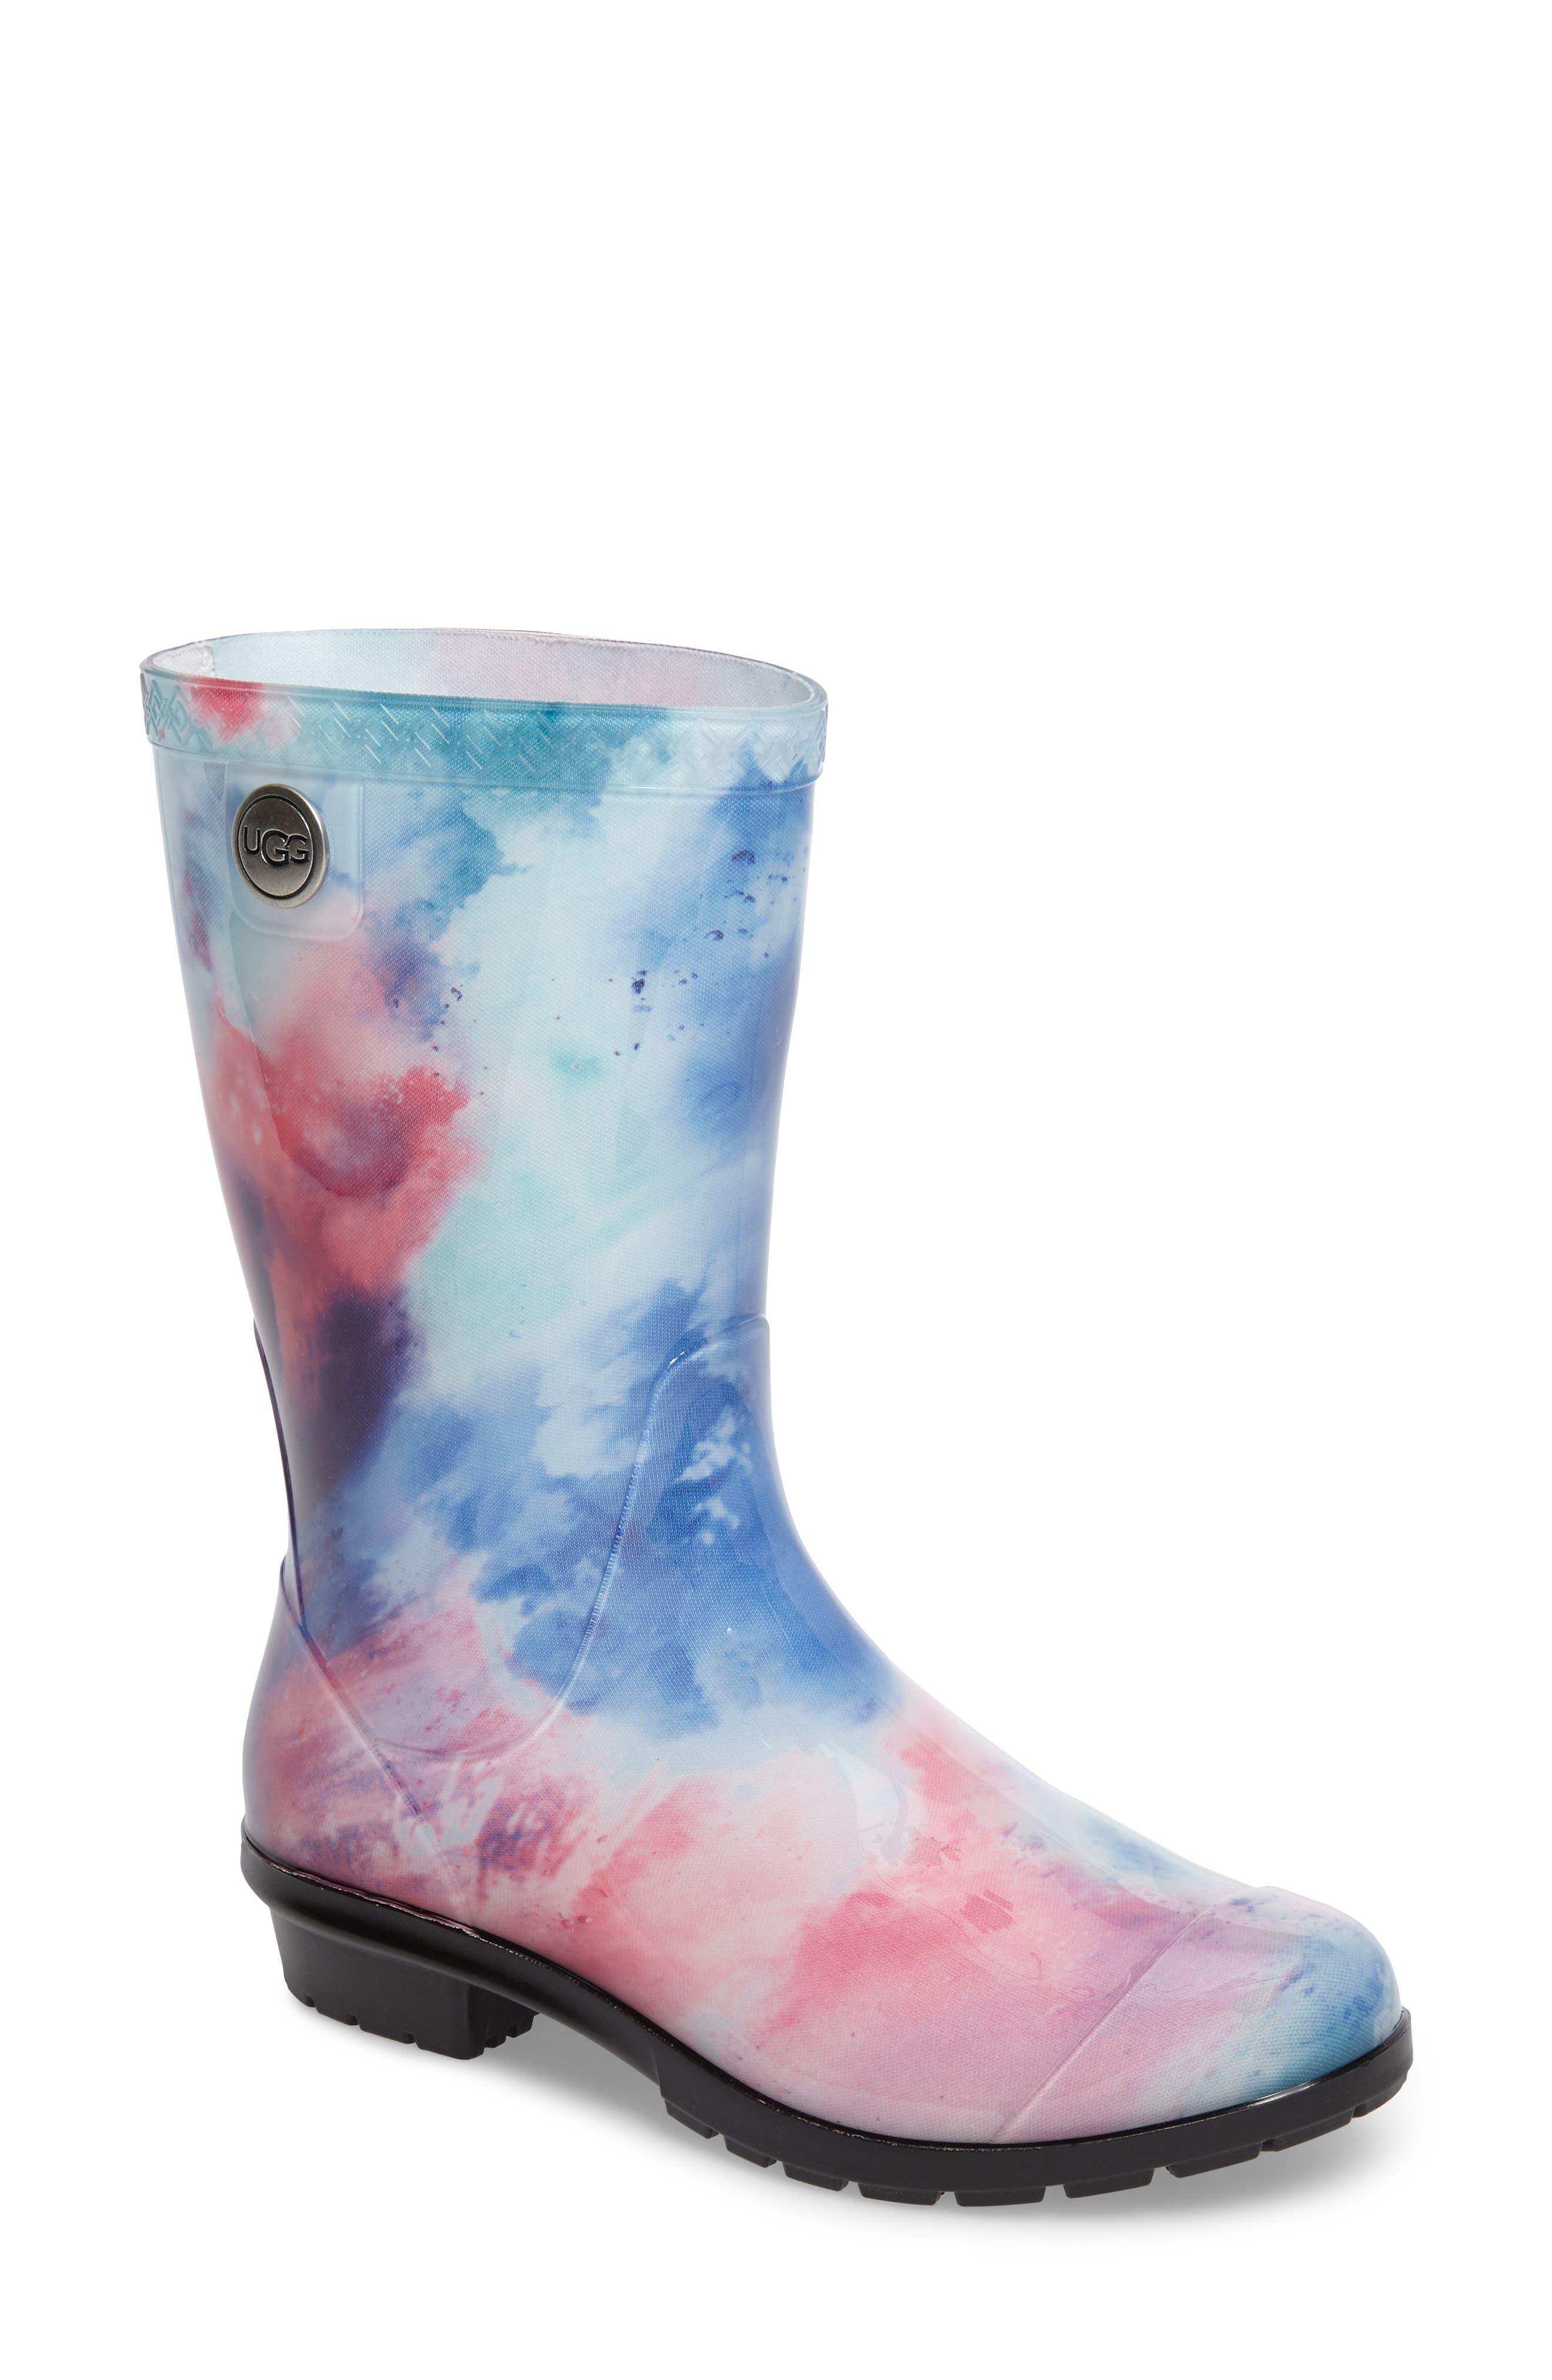 Sienna Watercolor Waterproof Rain Boot,                             Main thumbnail 1, color,                             Wild Rose/ Waterfall